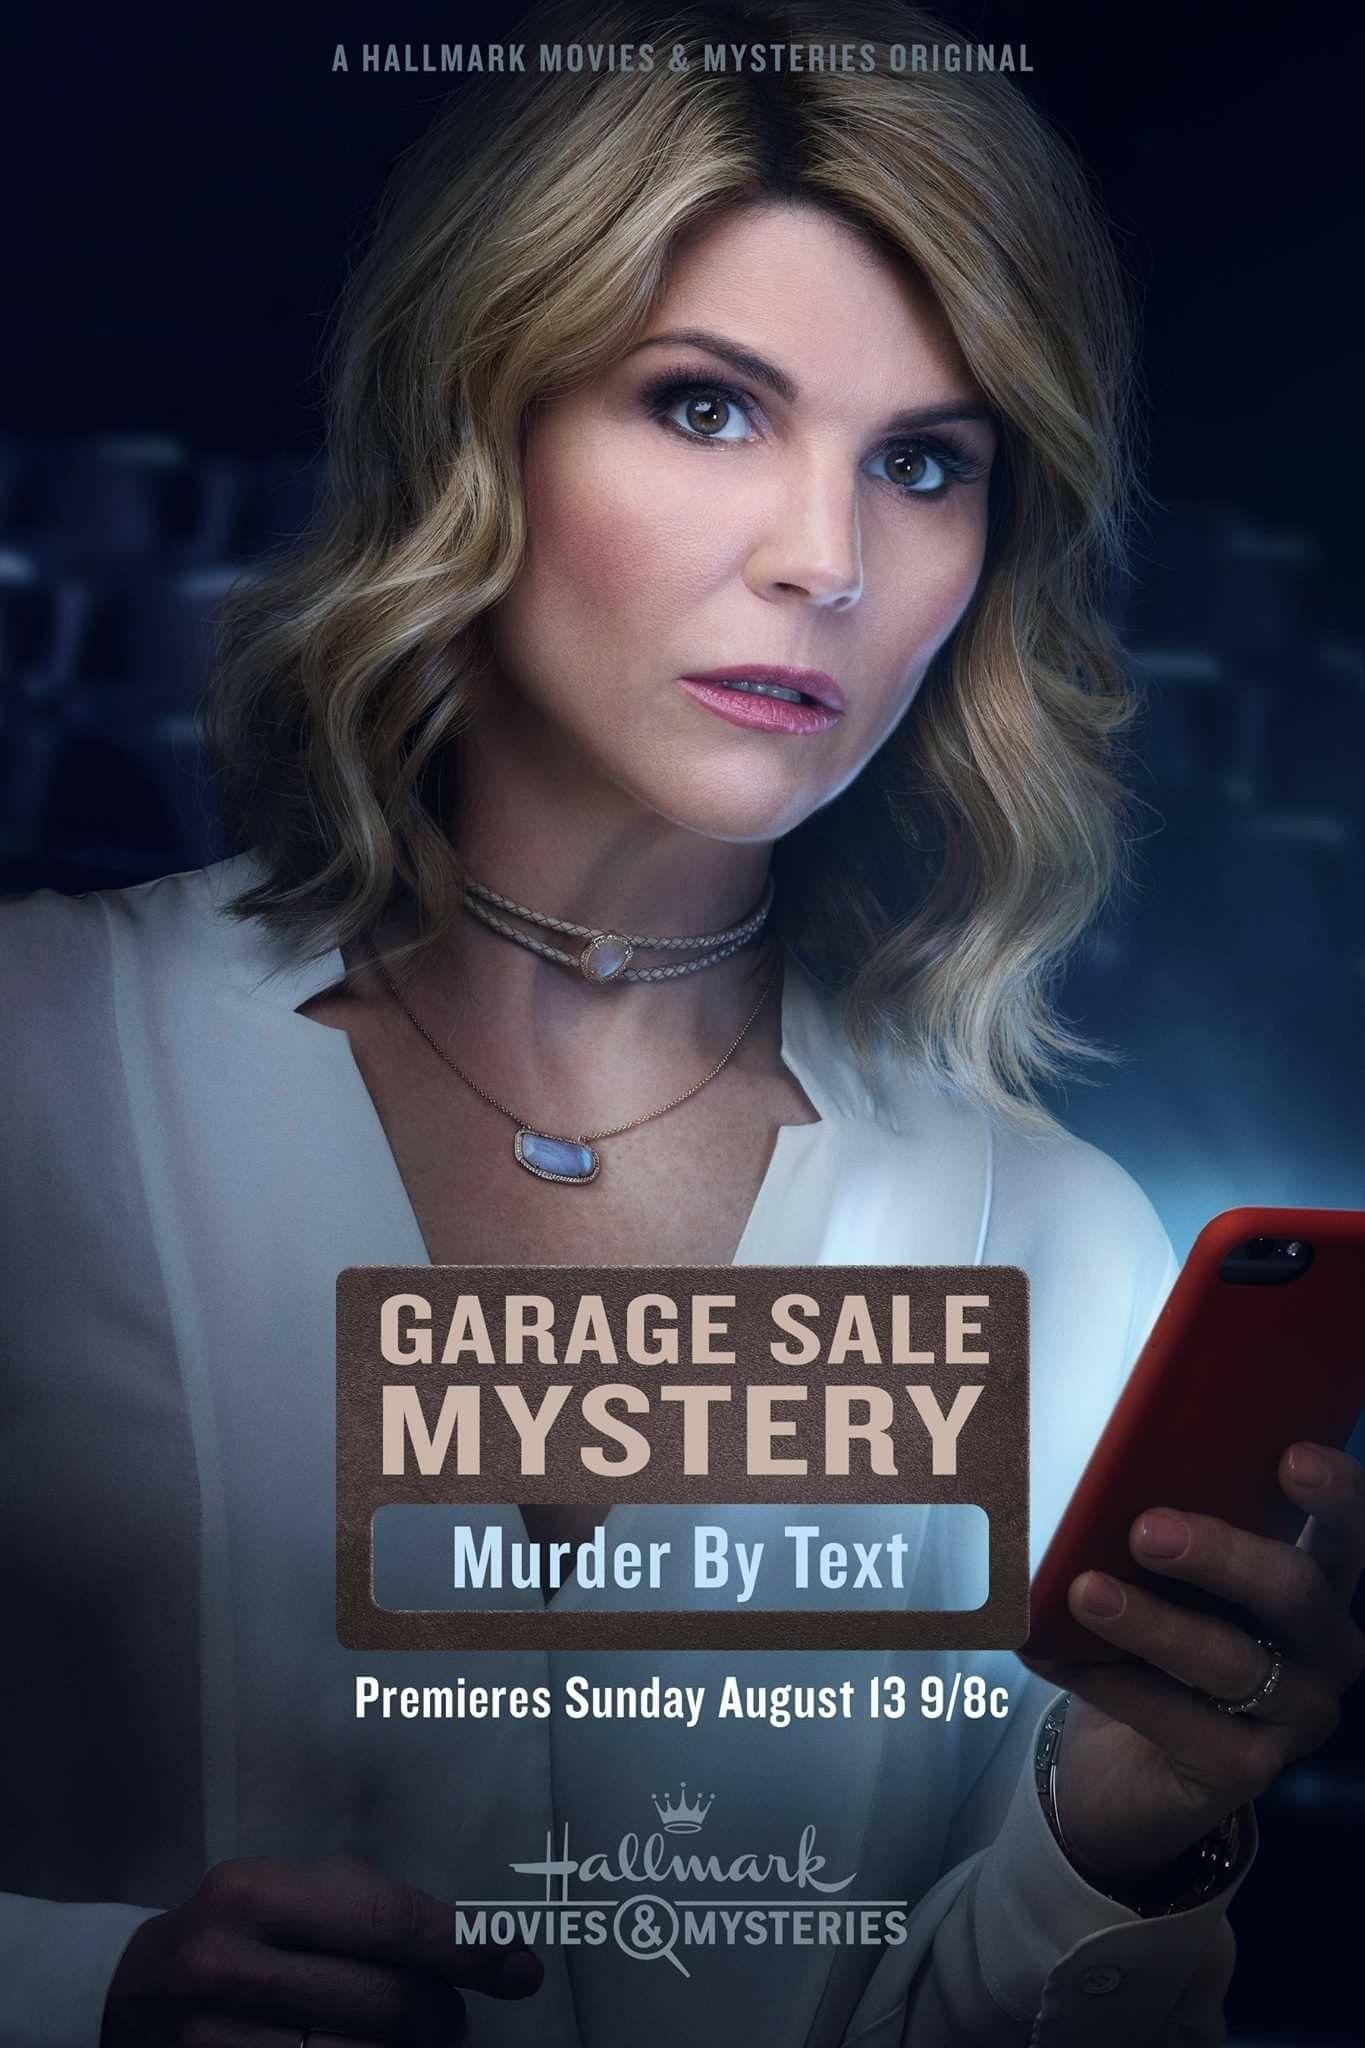 Pin By Lorie Ortiz On Cozy Mystery Movies Tv Garage Sale Mystery Hallmark Movies Lori Loughlin